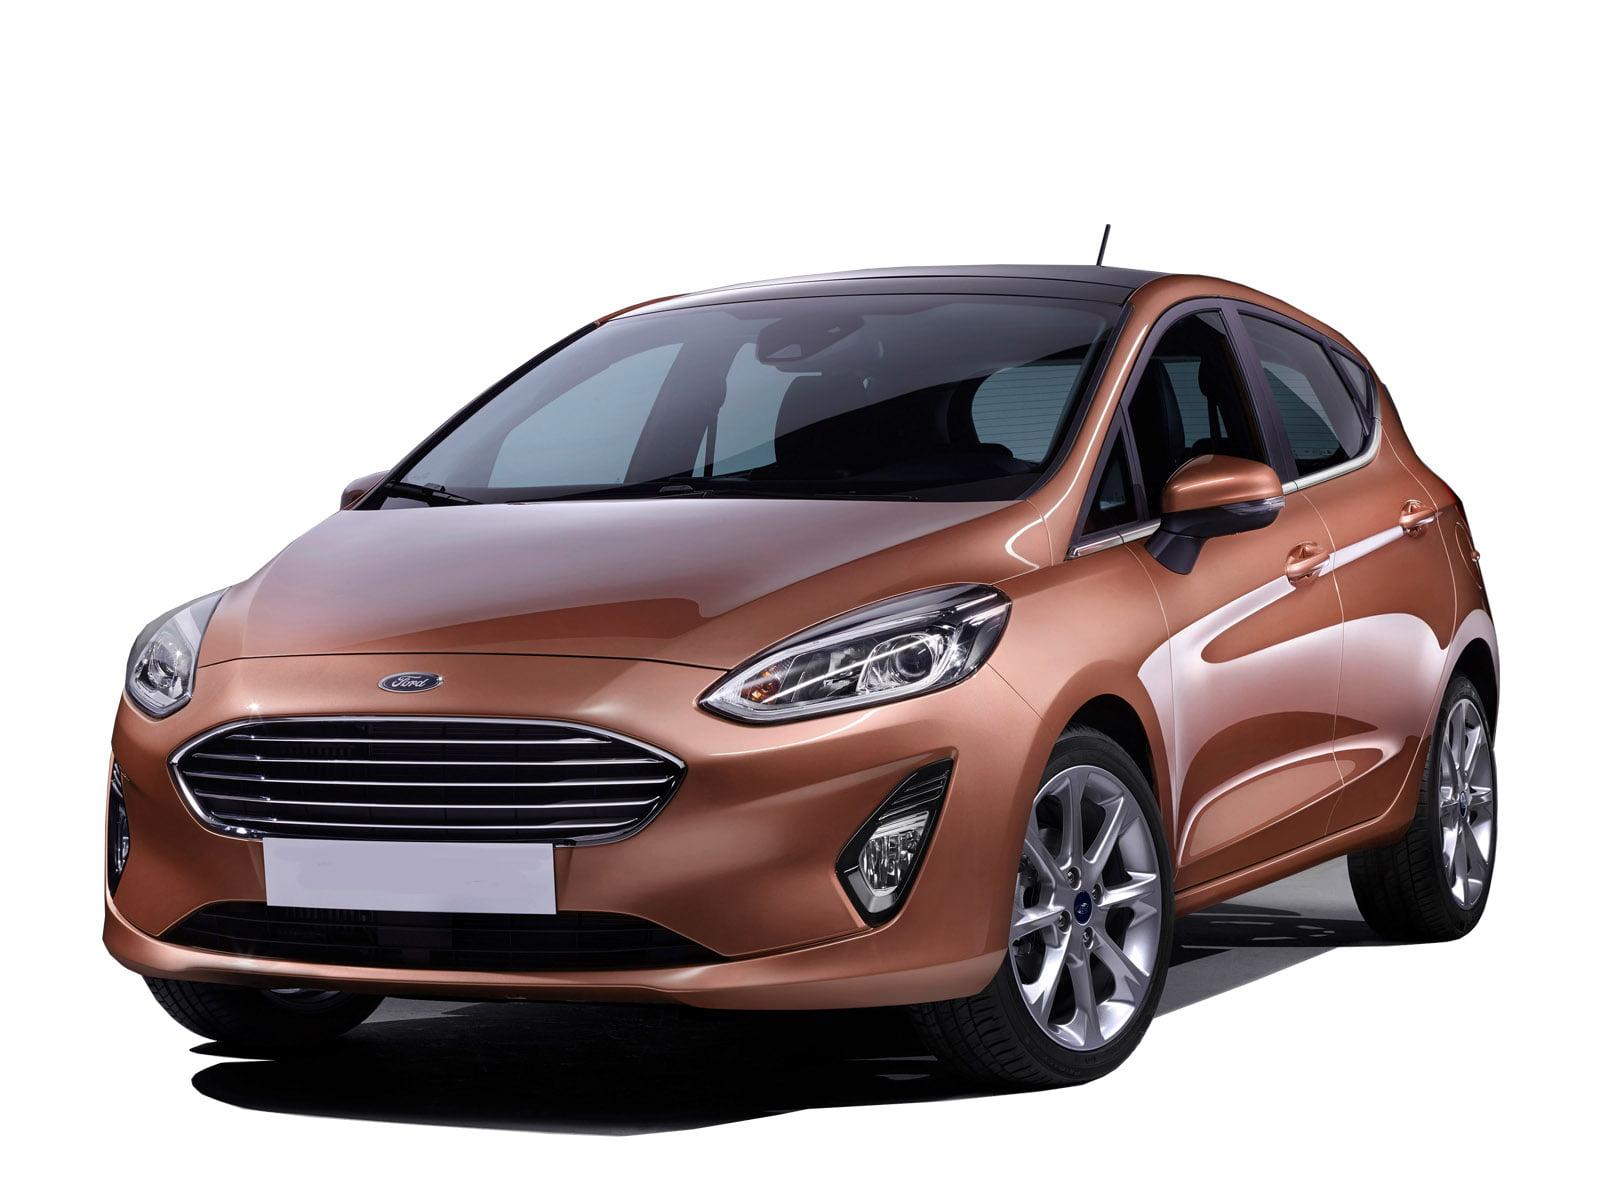 Ford Fiesta 1.1 52kW/70pk Trend 5d. (Voorraadauto met korte looptijd!)